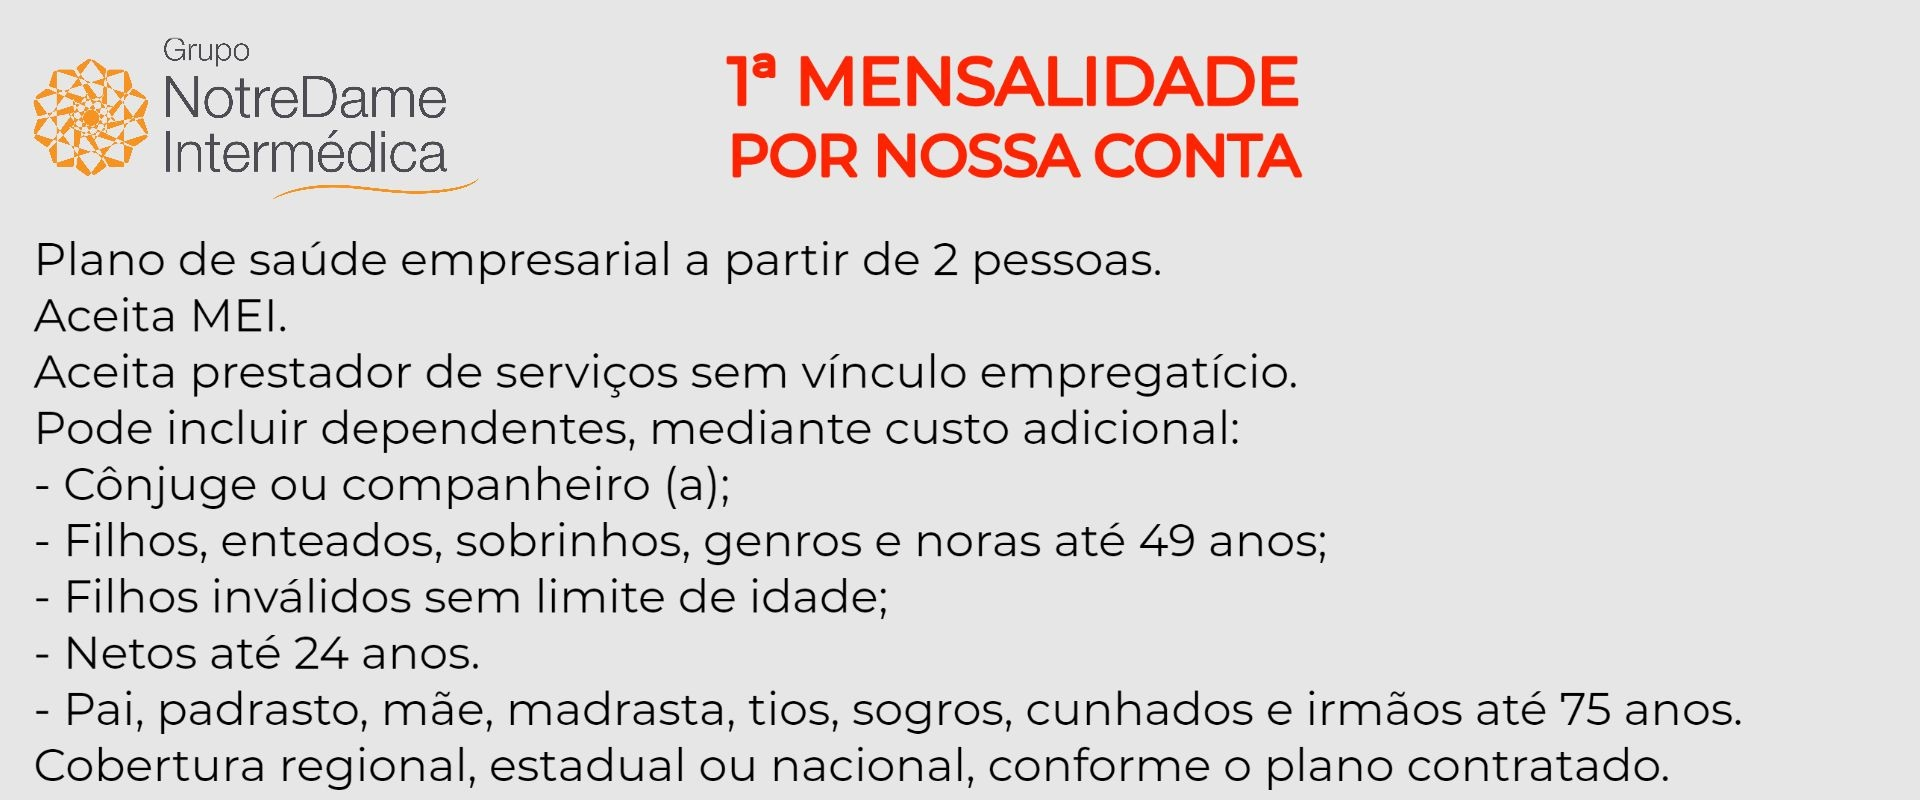 GNDI - Grupo Notredame Intermédica Empresarial em Bragança Paulista